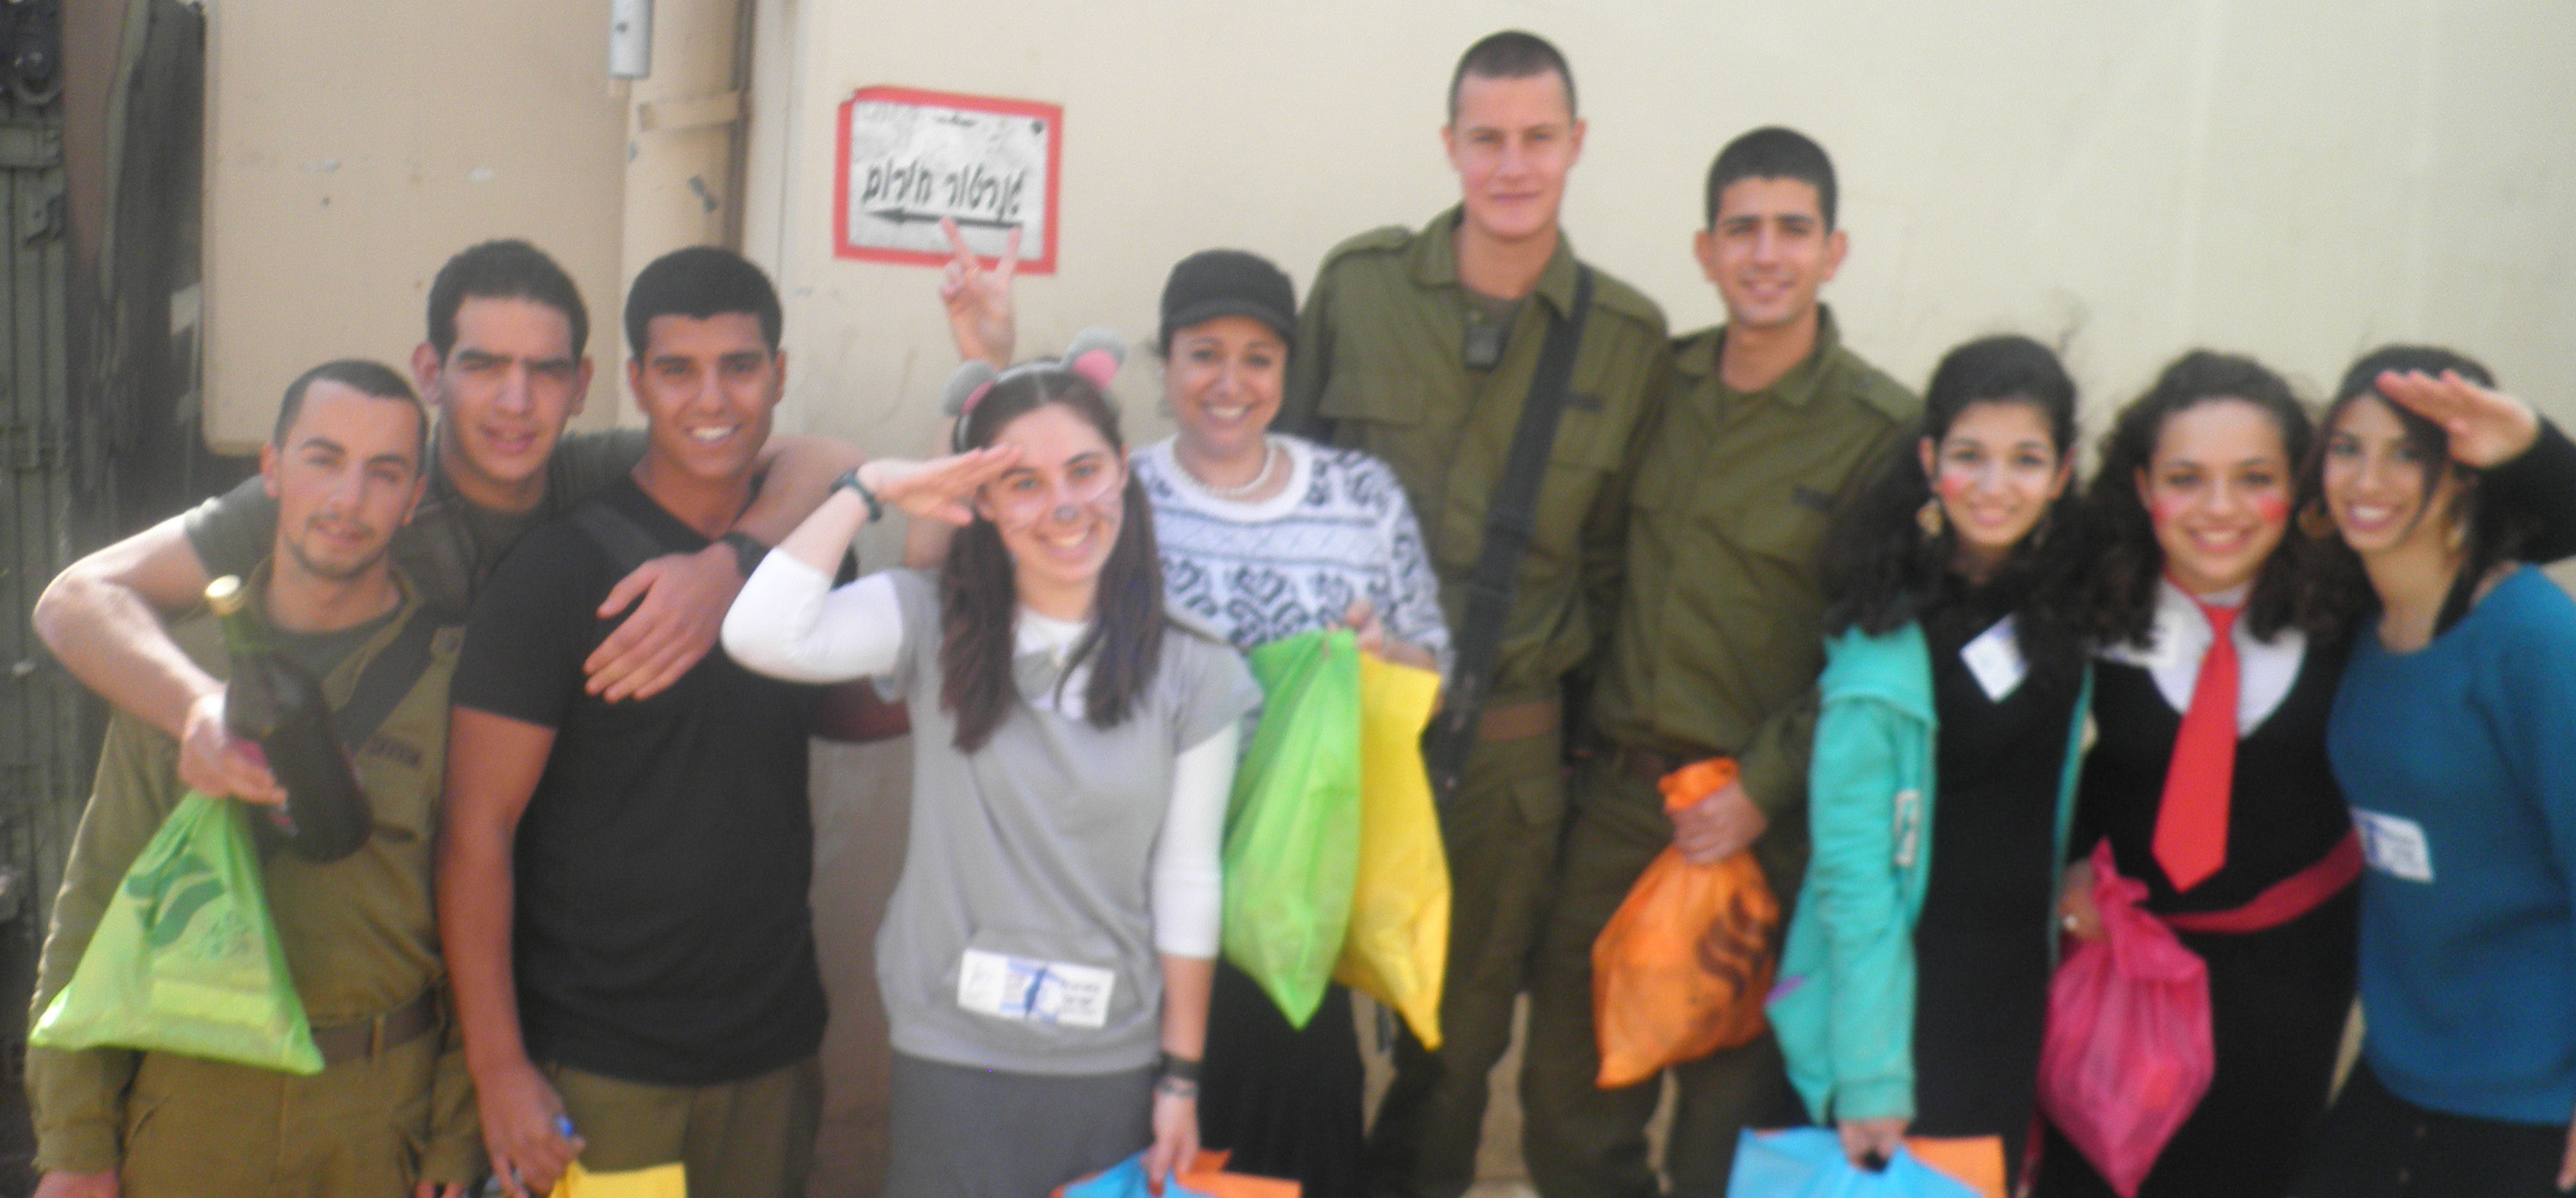 Volunteers with Soldiers